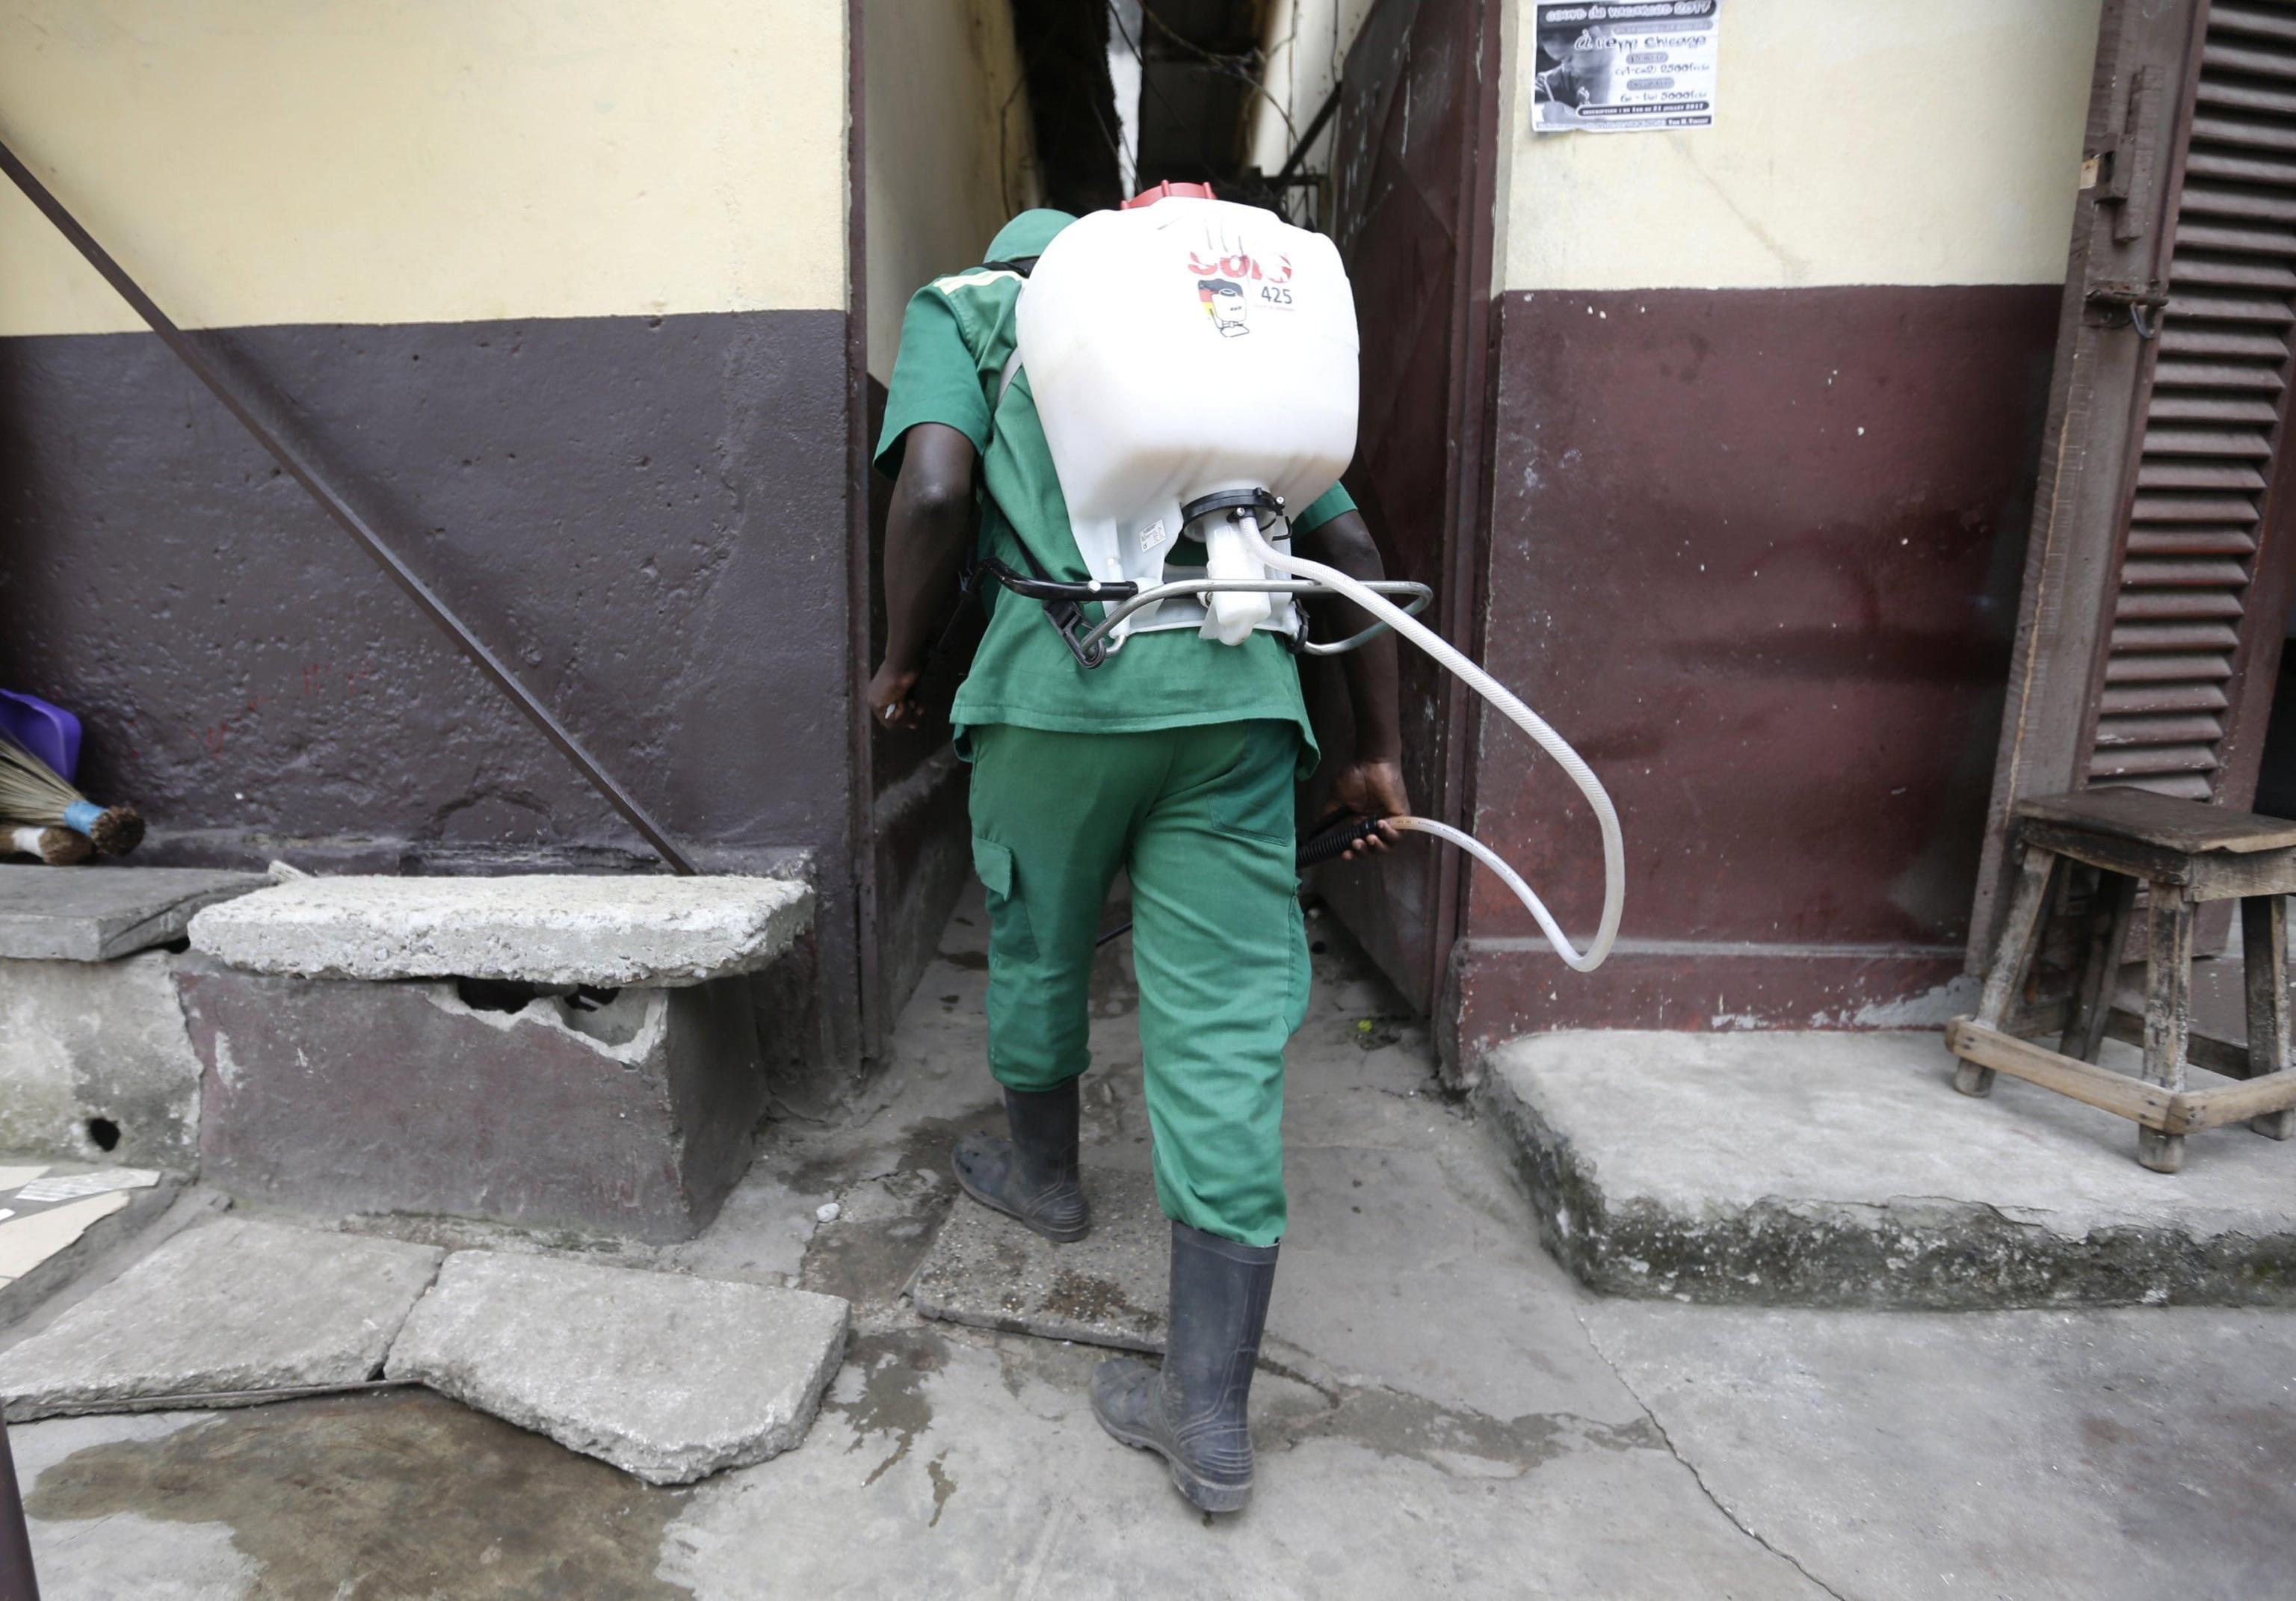 Epidemia di peste in Madagascar: già 1.192 i casi confermati e 124 morti